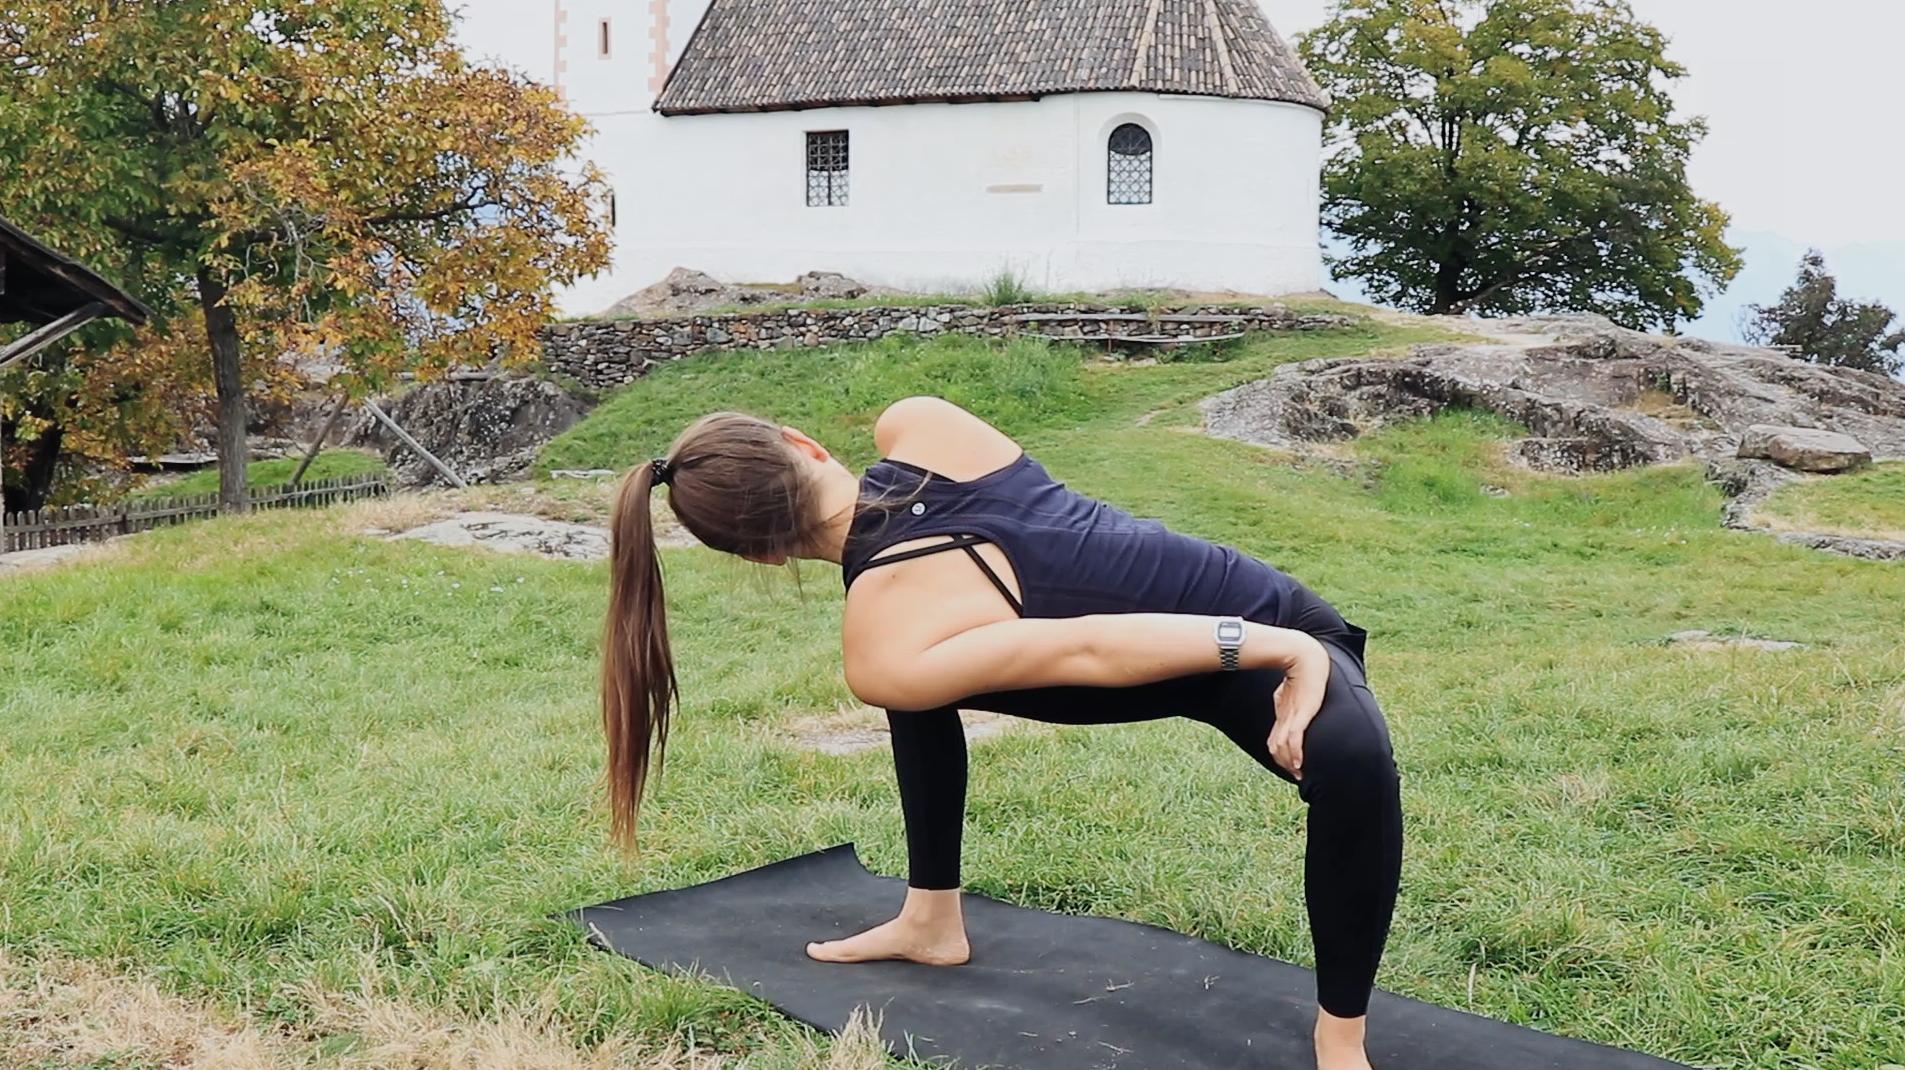 Mady-Morrison-Yoga-Mountain-Flow-Kraft-Staerke-00011